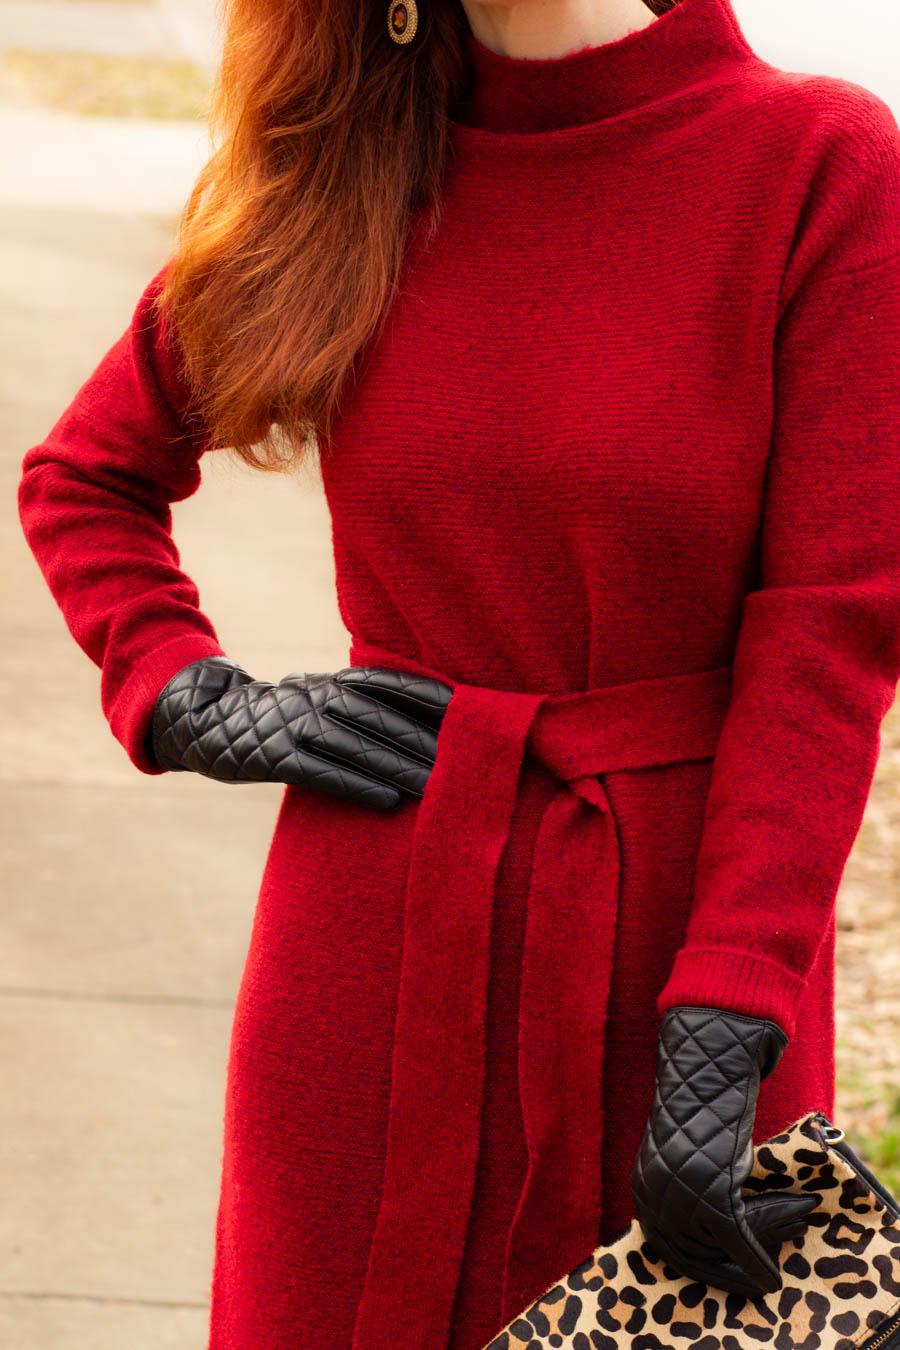 Target women's red sweater dress